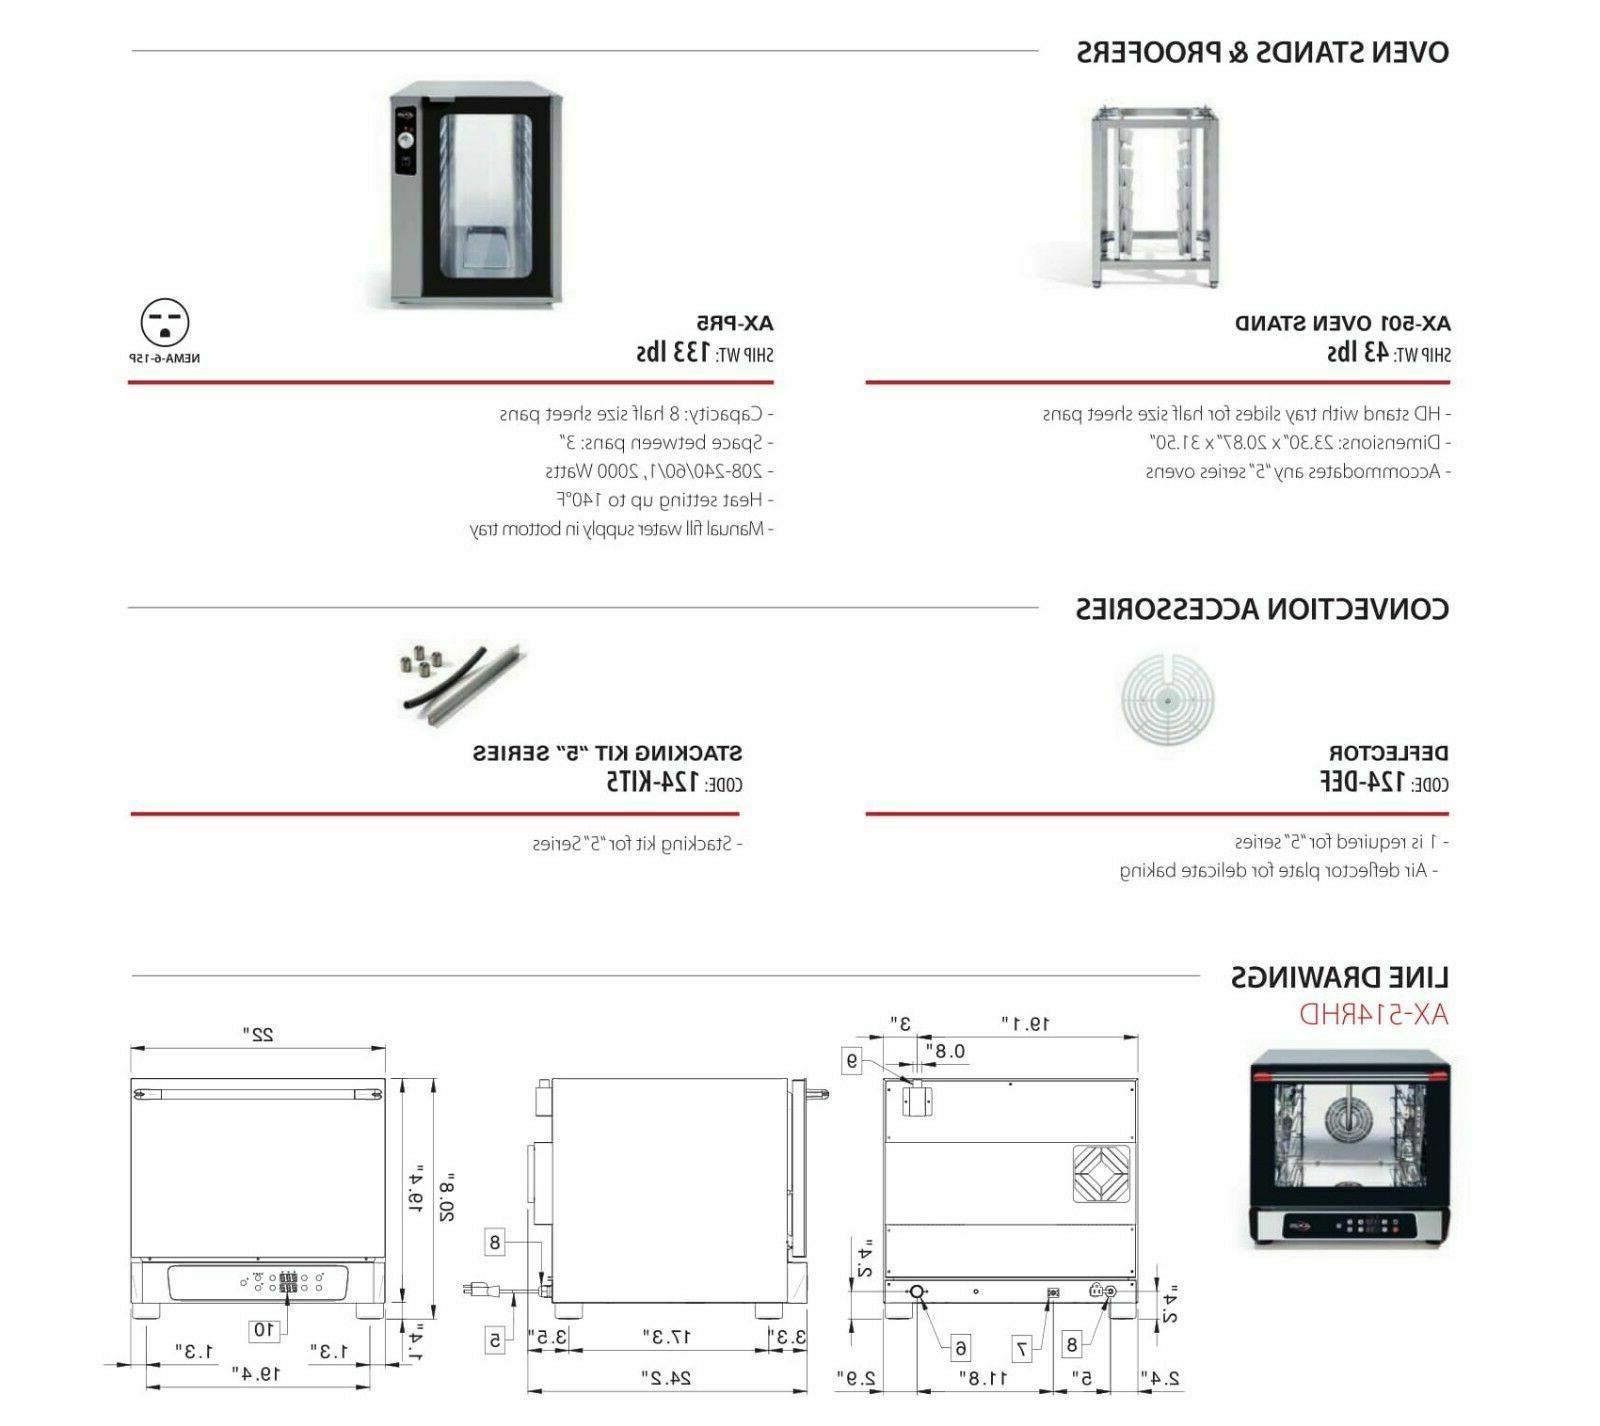 Oven 1/2 Humidity Controls